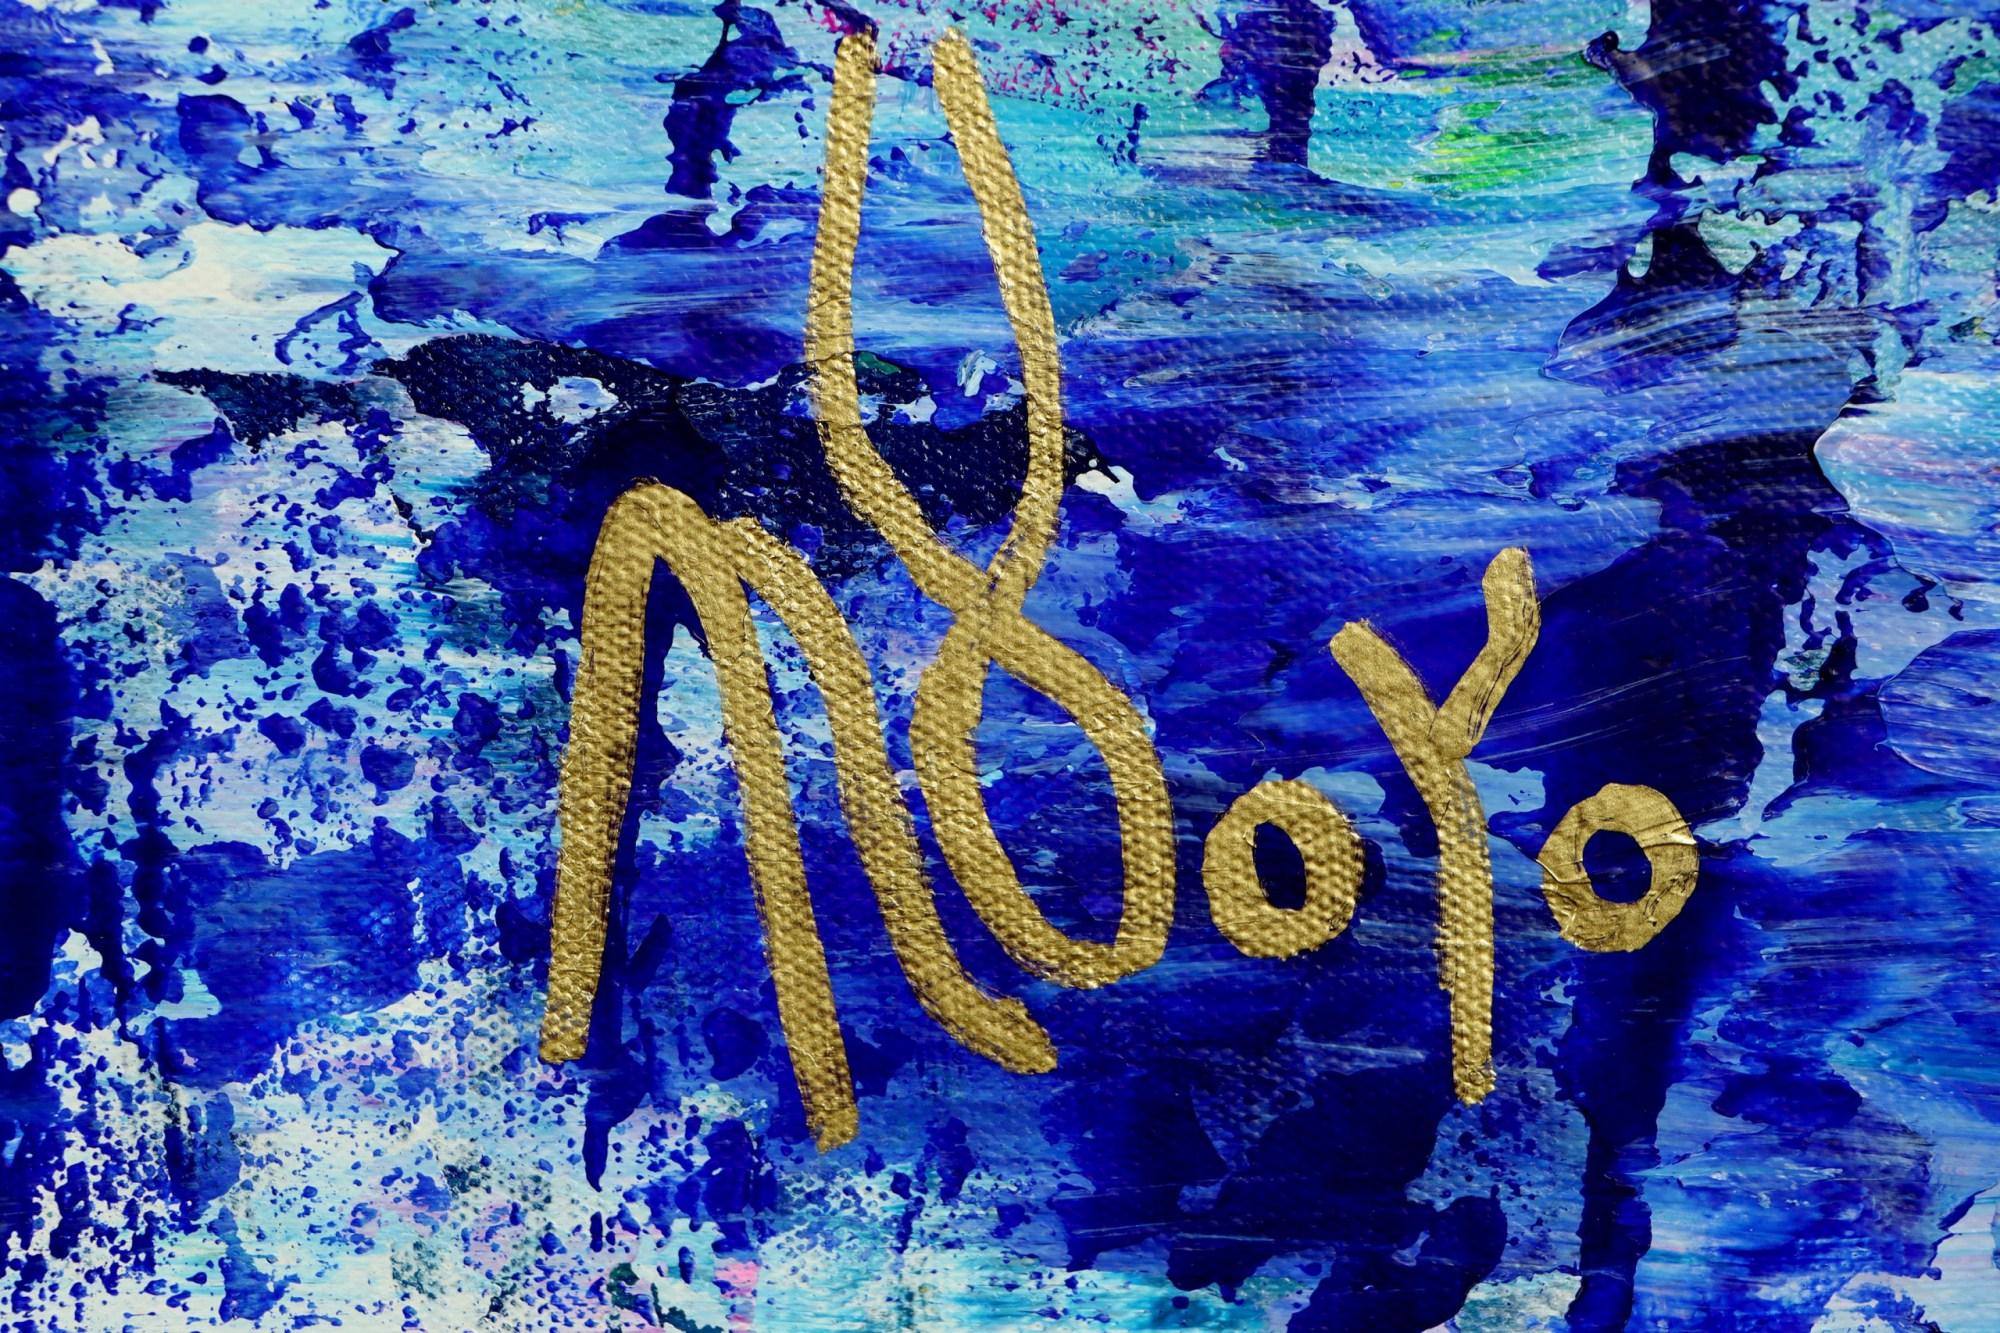 Signature / Caribbean Ocean Waters (2021) by Nestor Toro